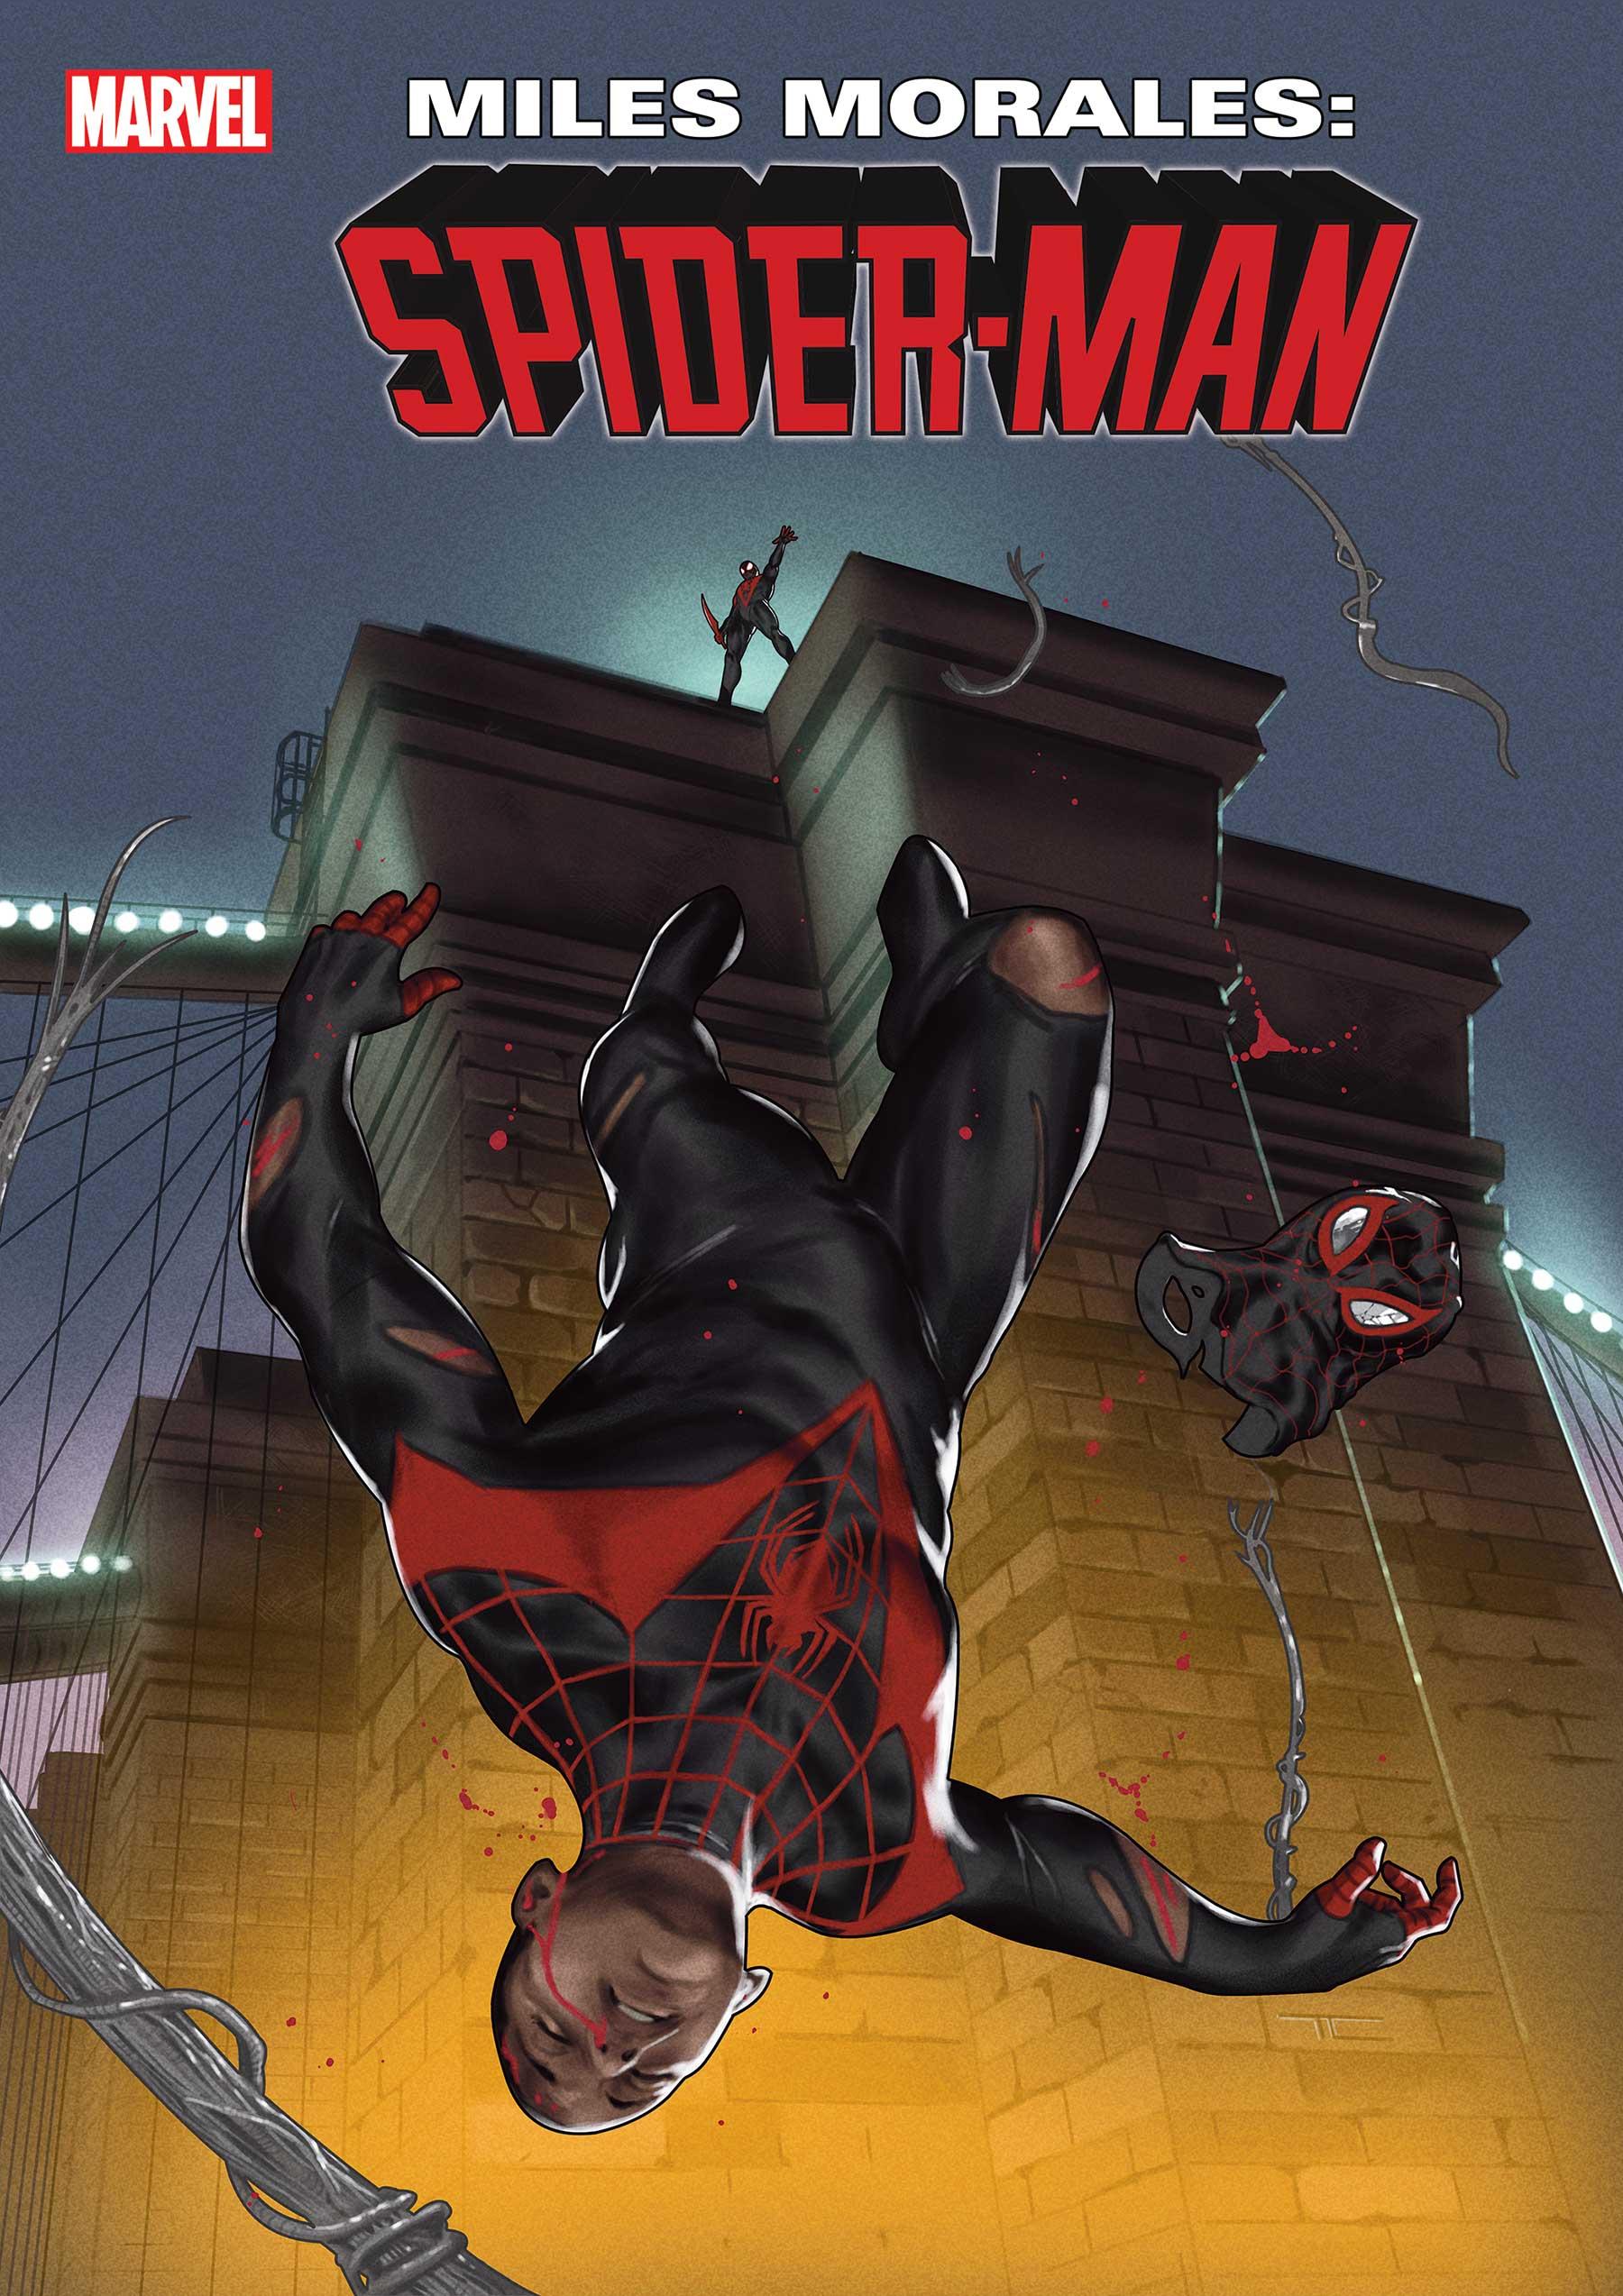 Miles Morales: Spider-Man (2018) #28